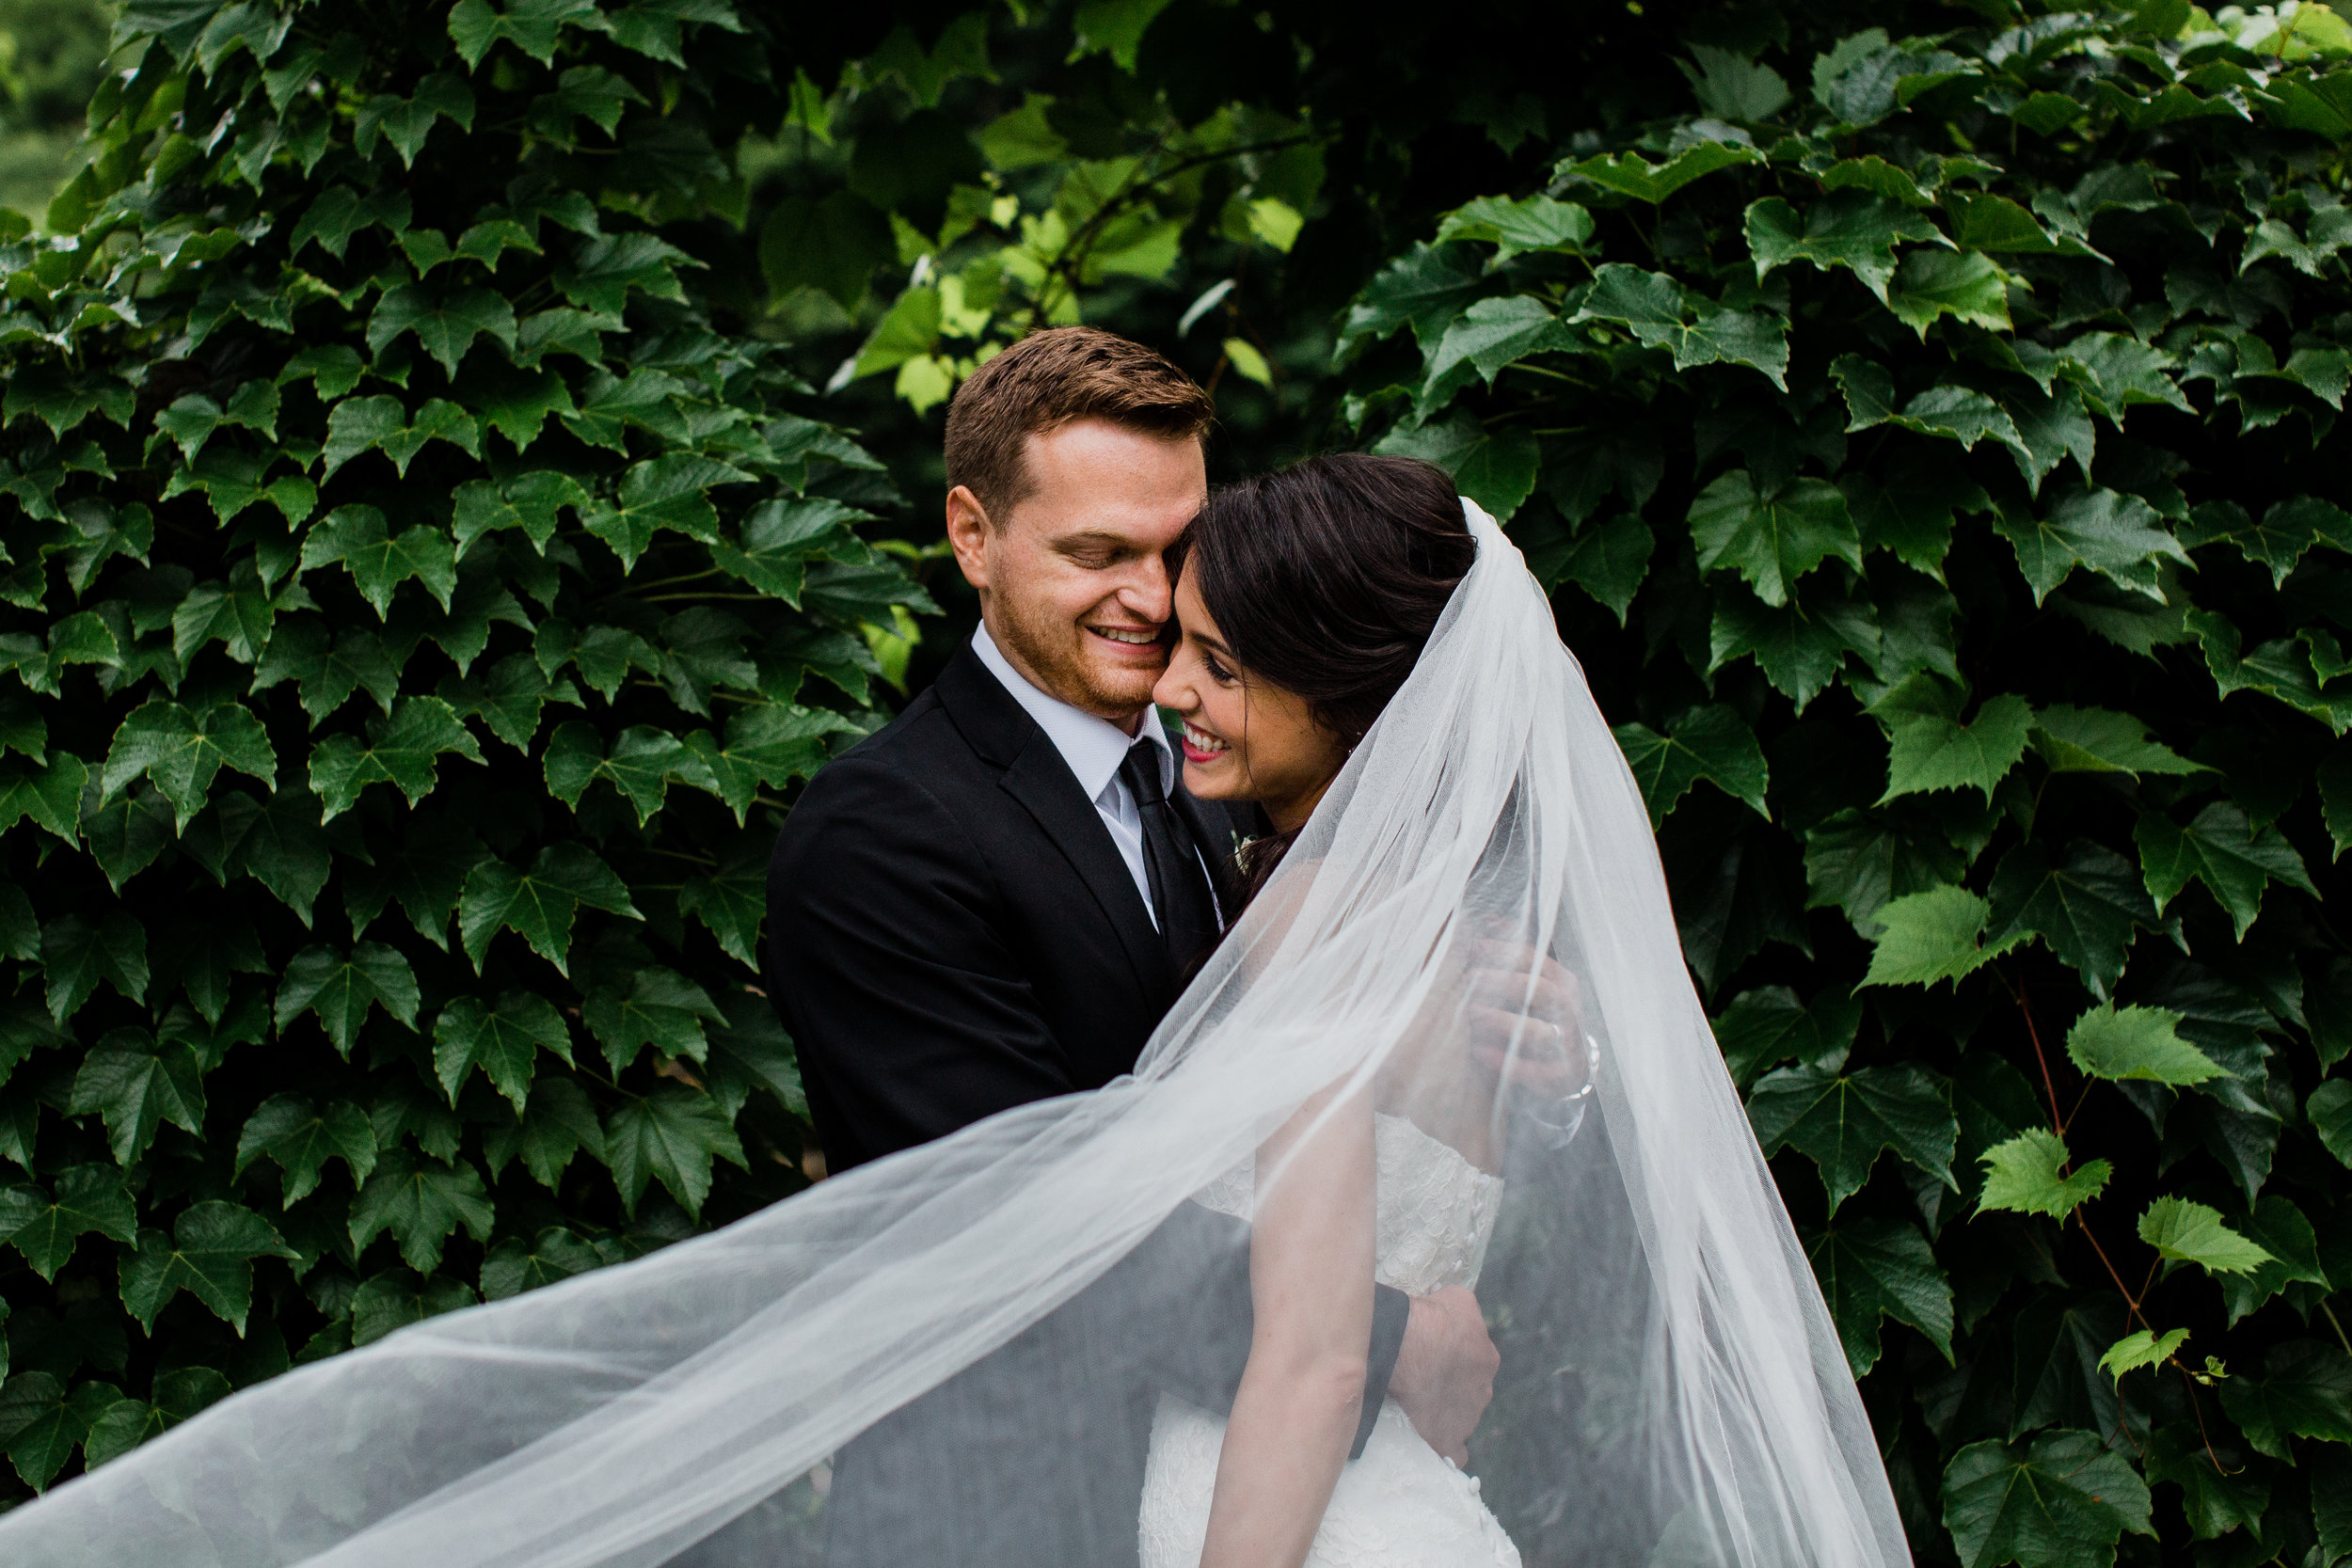 JAG STUDIOS Wedding & Portrait photographer  EDITING LEVEL: BASIC+ Preset: Client based WE EDIT: Full galleries